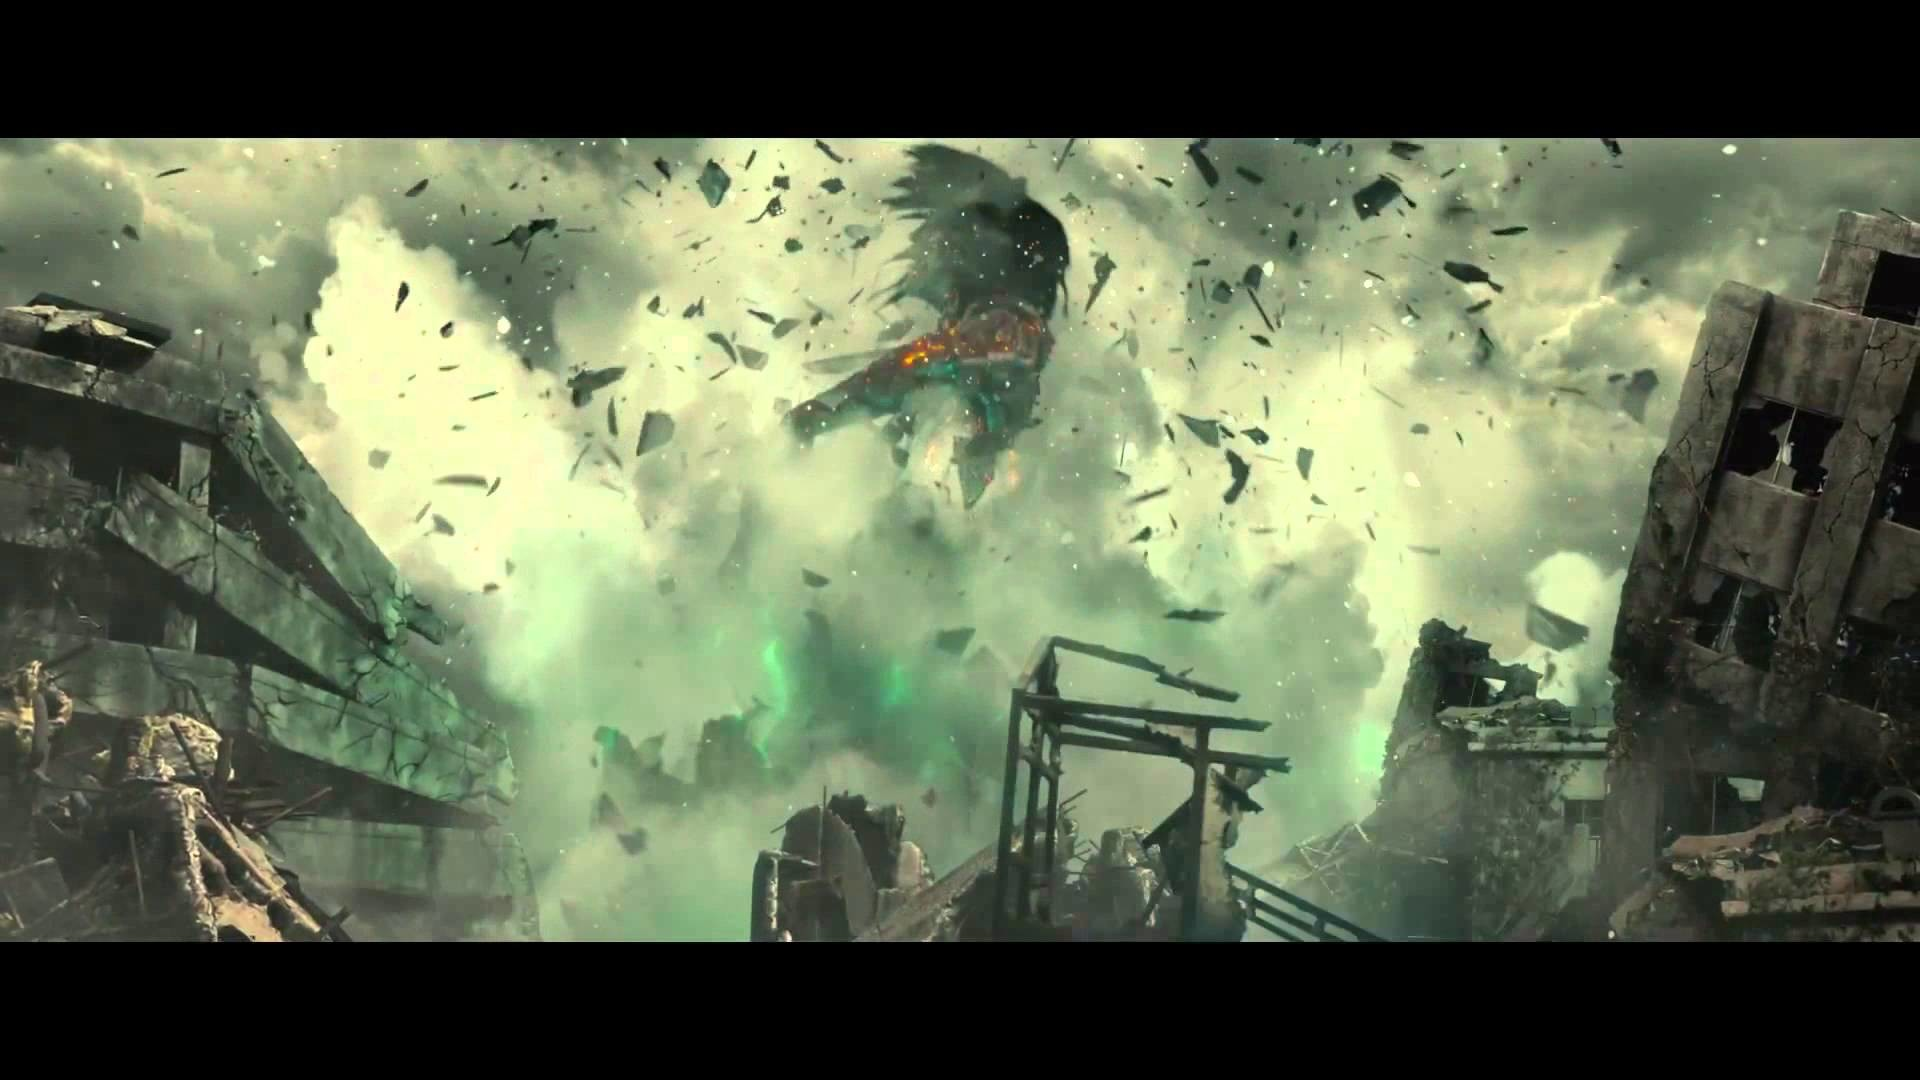 Attack on Titan 進撃の巨人 (Shingeki no Kyojin) Live Action Final Trailer HD